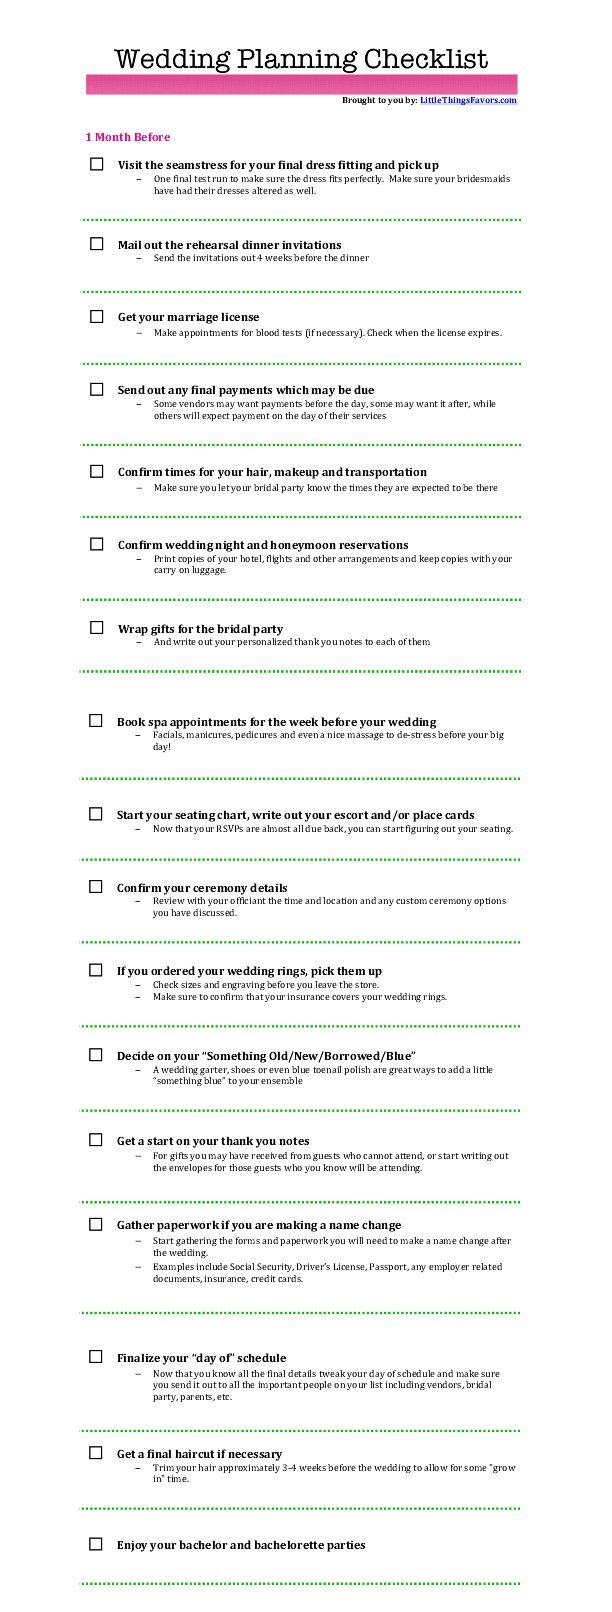 free printable #wedding #planning checklist 1 month before ...